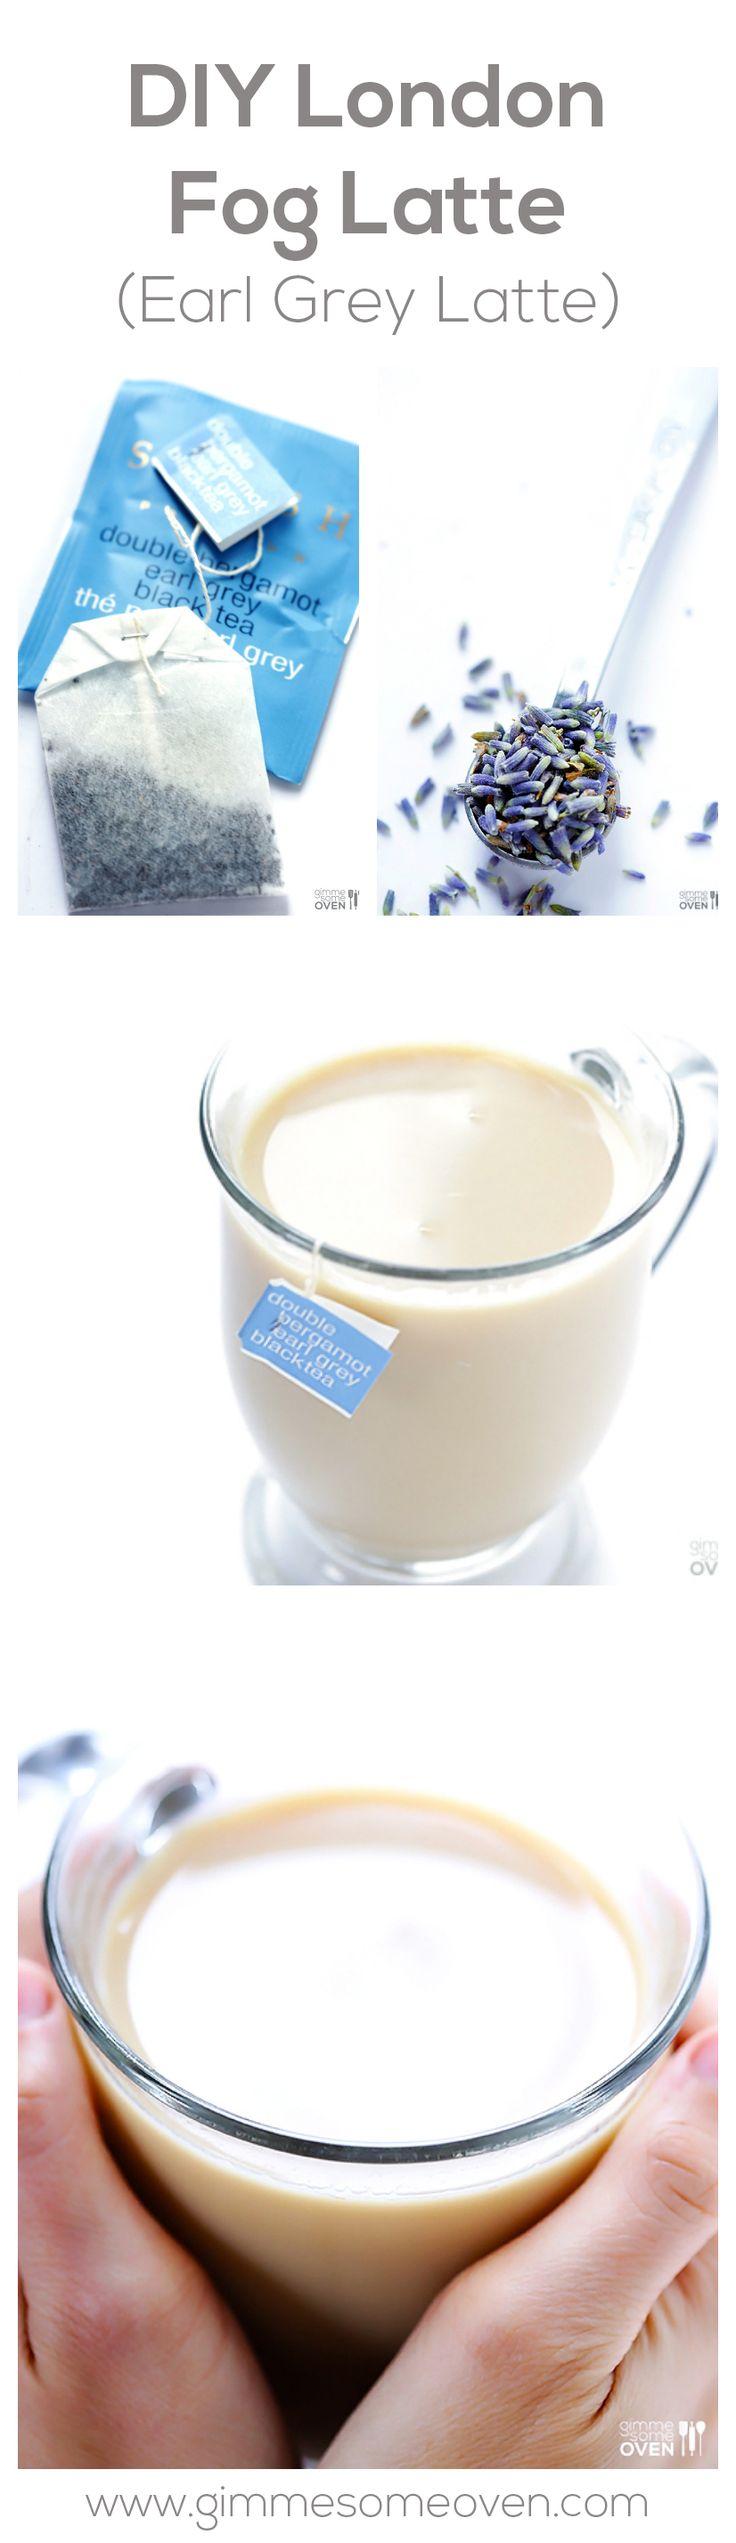 DIY London Fog Latte (Earl Grey Latte)